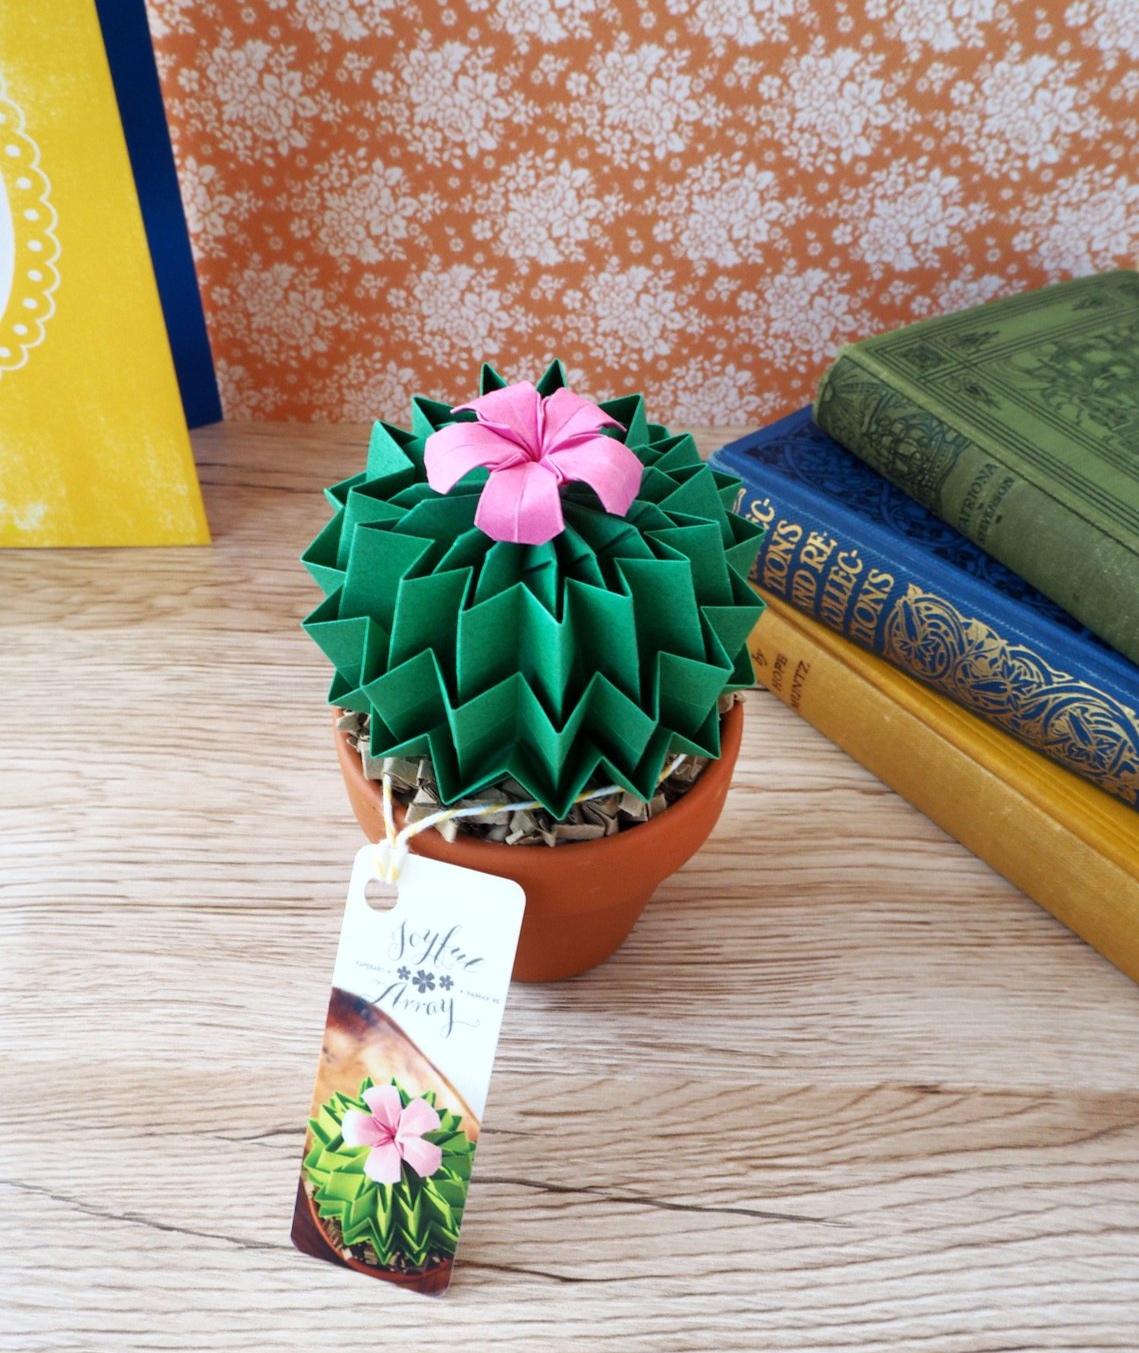 Origami Paper Cactus By JoyfulArray